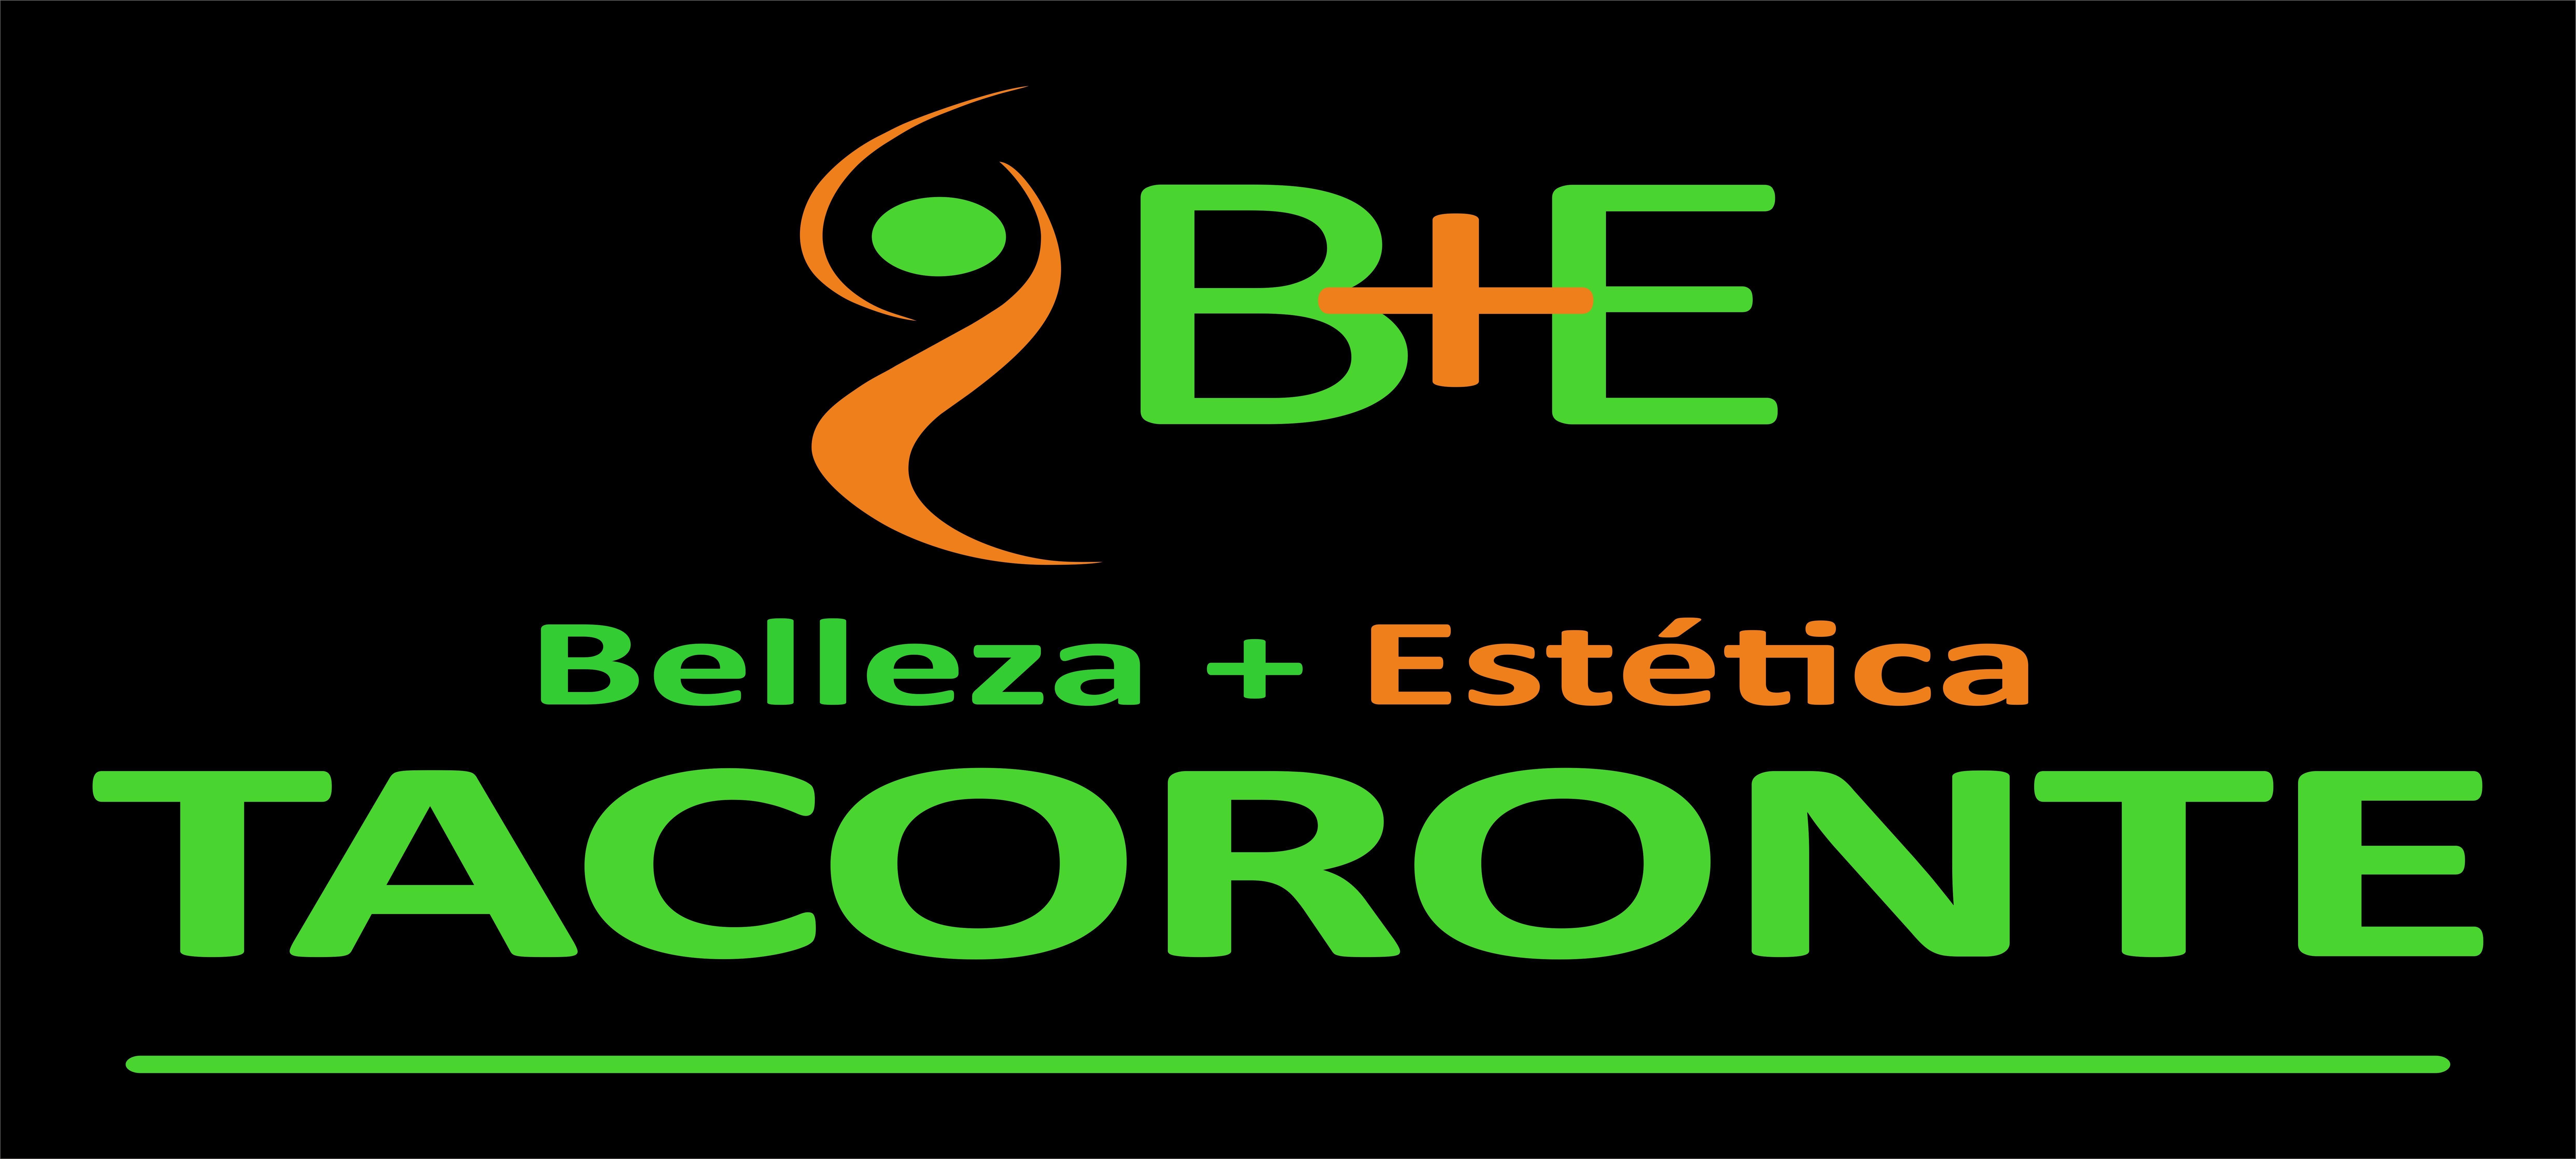 Foto 10 de Belleza en Tacoronte | Belleza+Estética Tacoronte